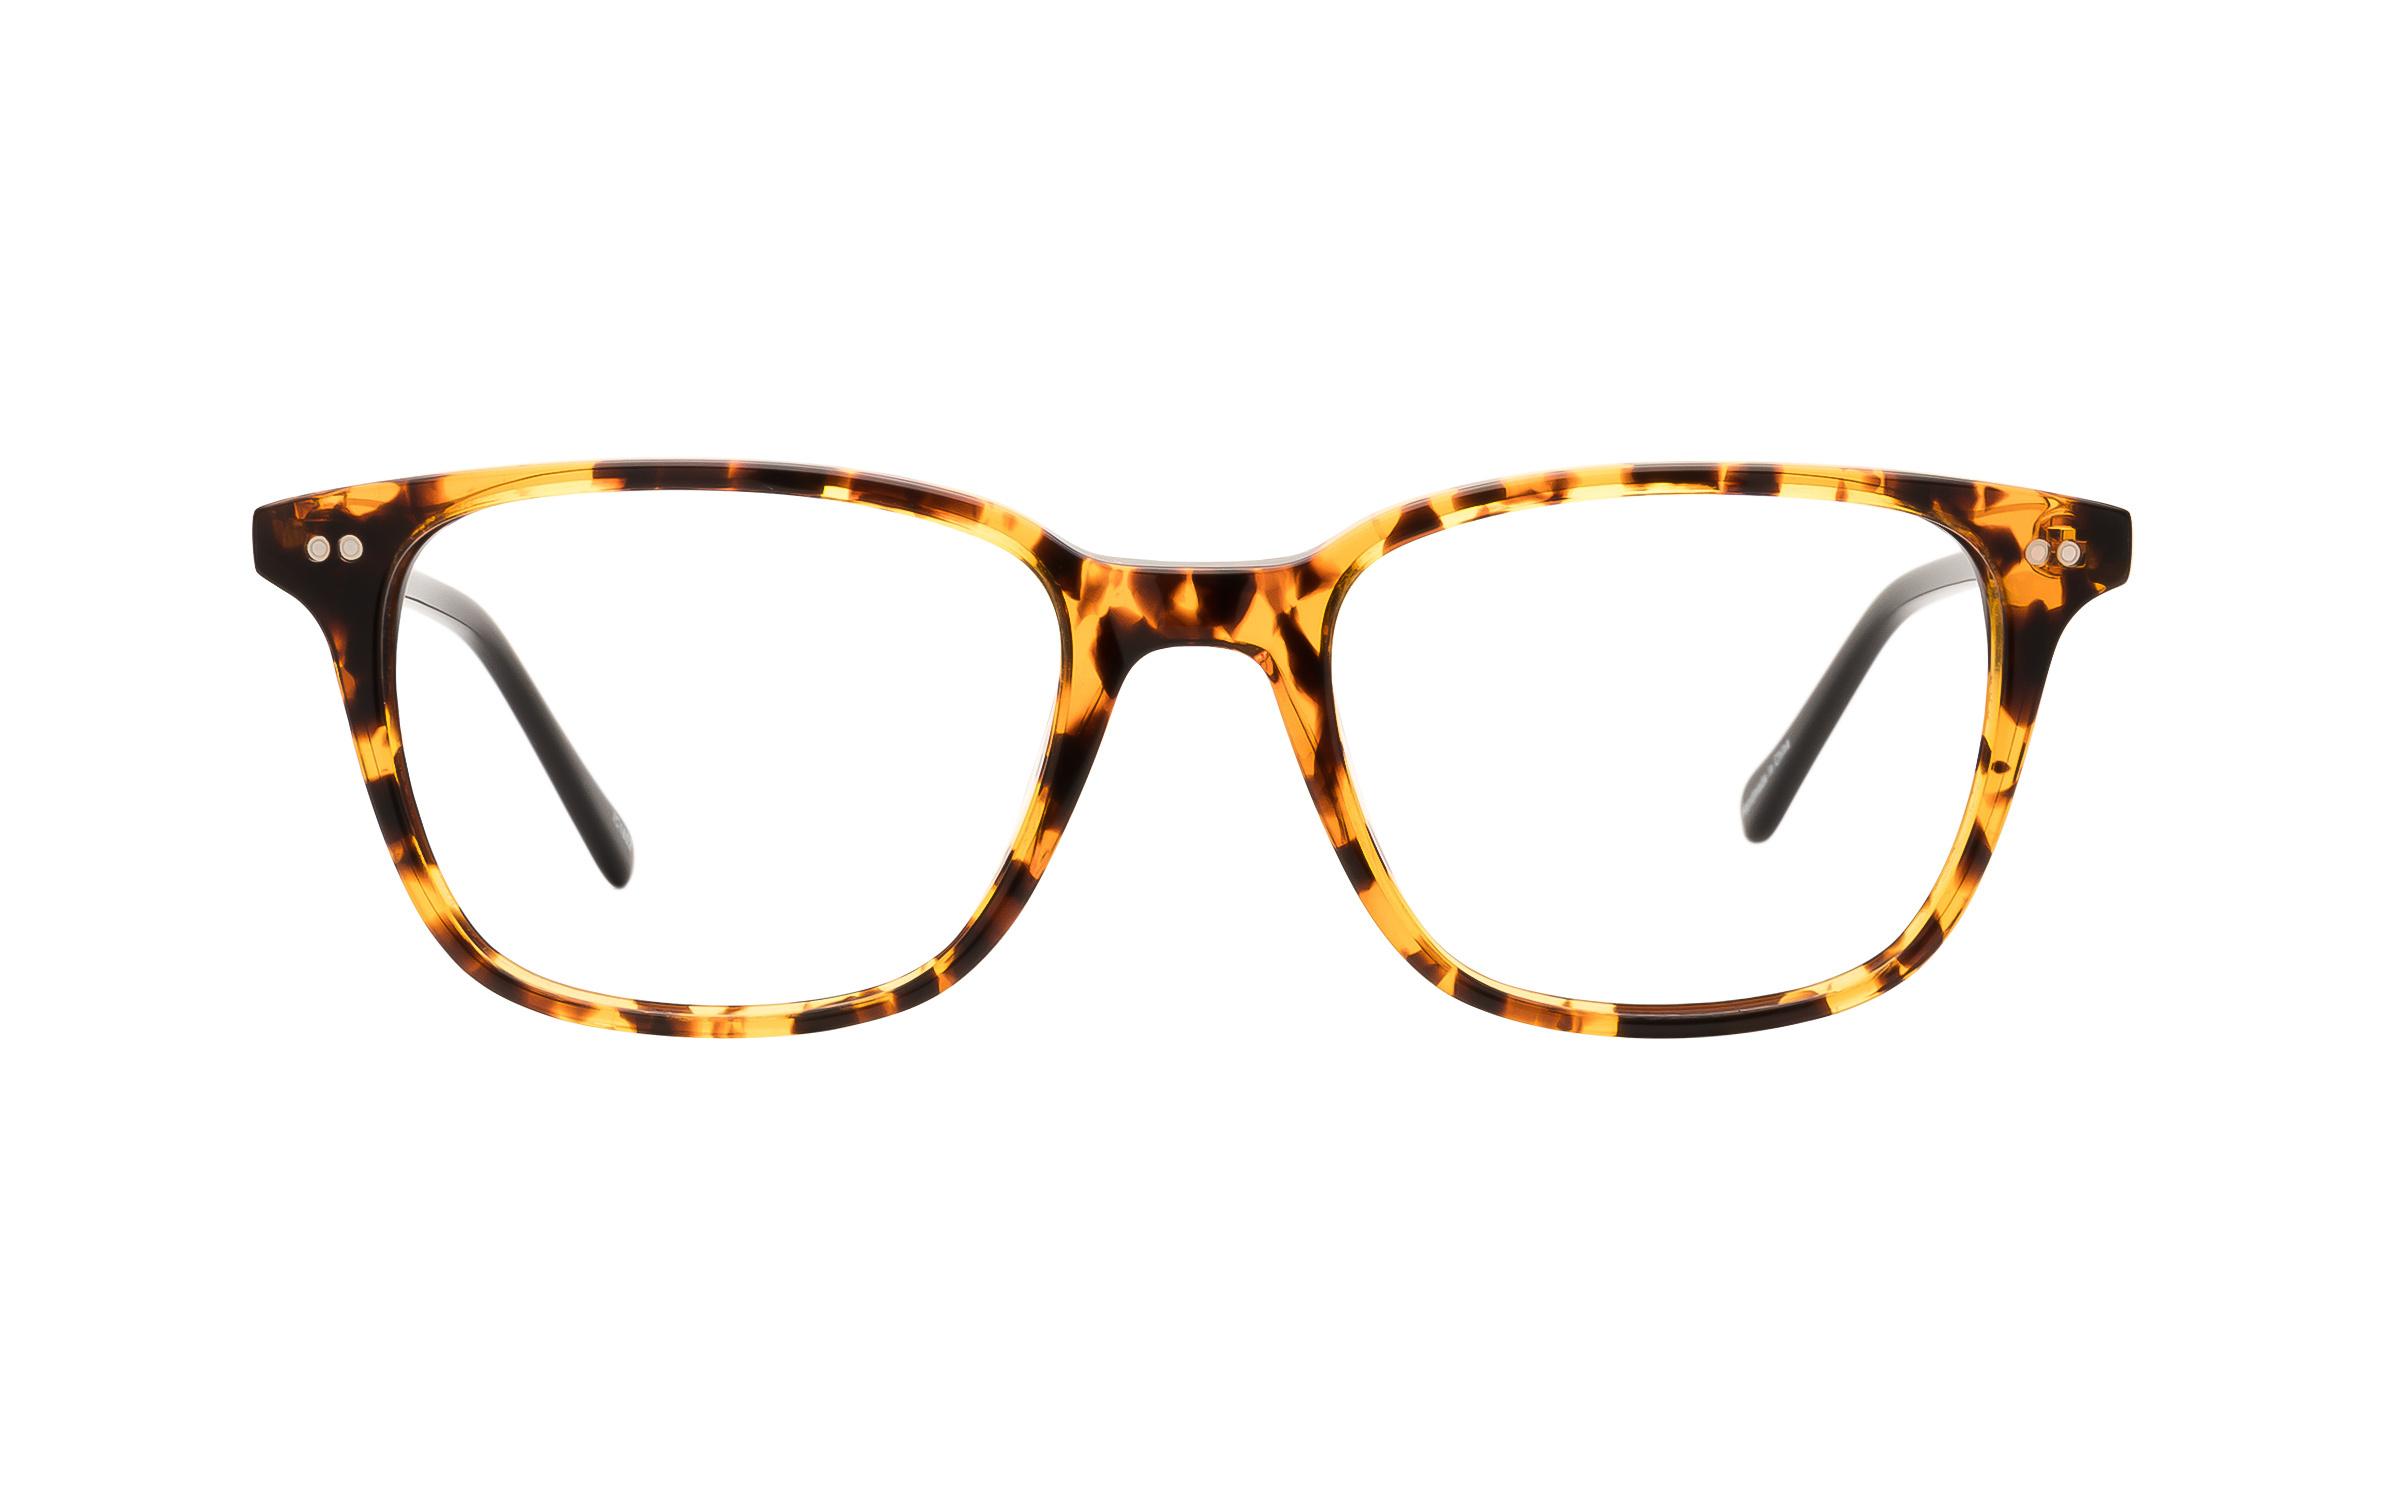 Tortoise, Brown Acetate D-Frame Derek Cardigan Glasses - Clearly Glasses Online